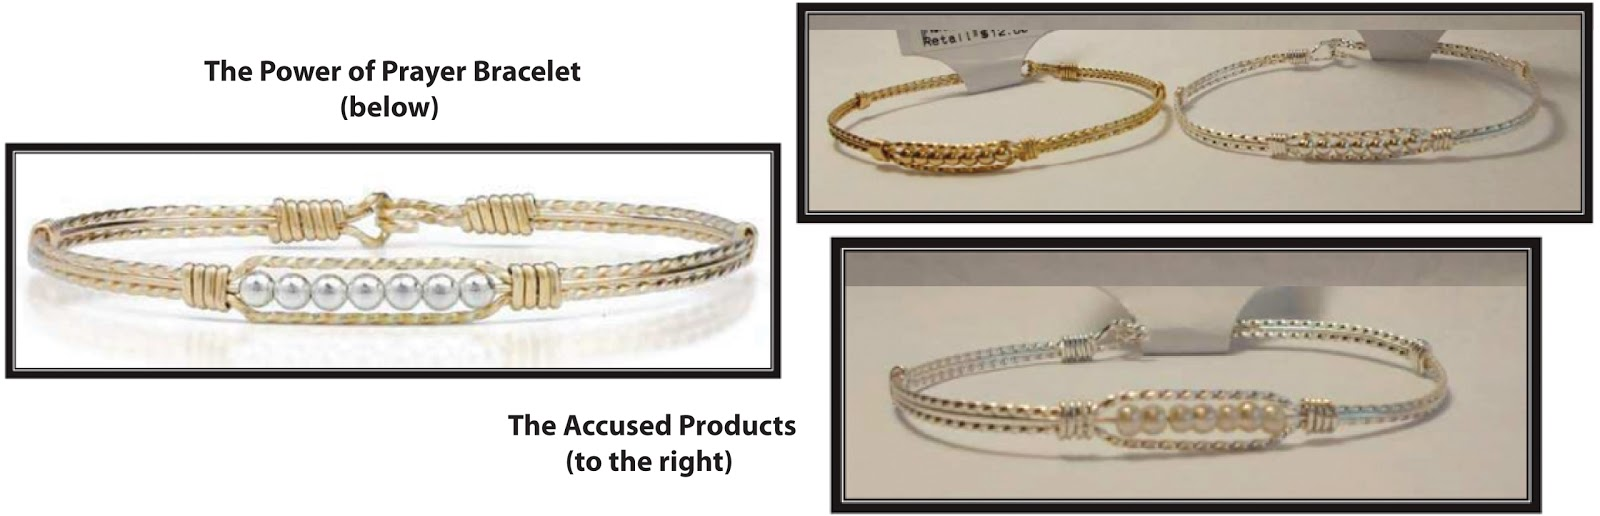 Jewelry Design Theft Raised by Ronaldo Designer Jewelry Against